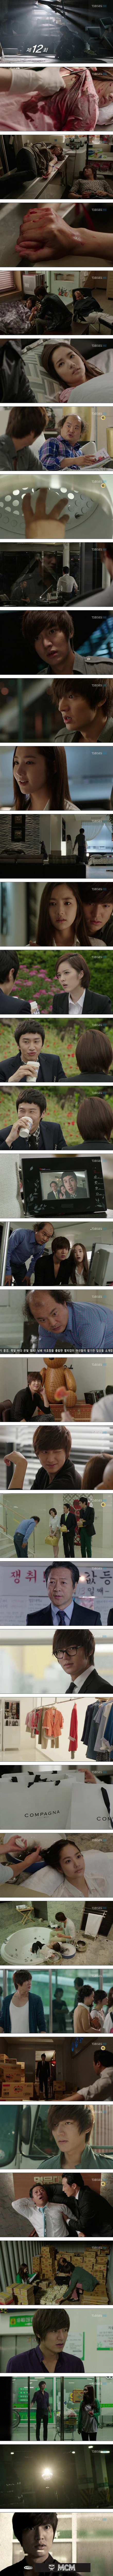 Spoiler] Added episode 12 captures for the Korean drama